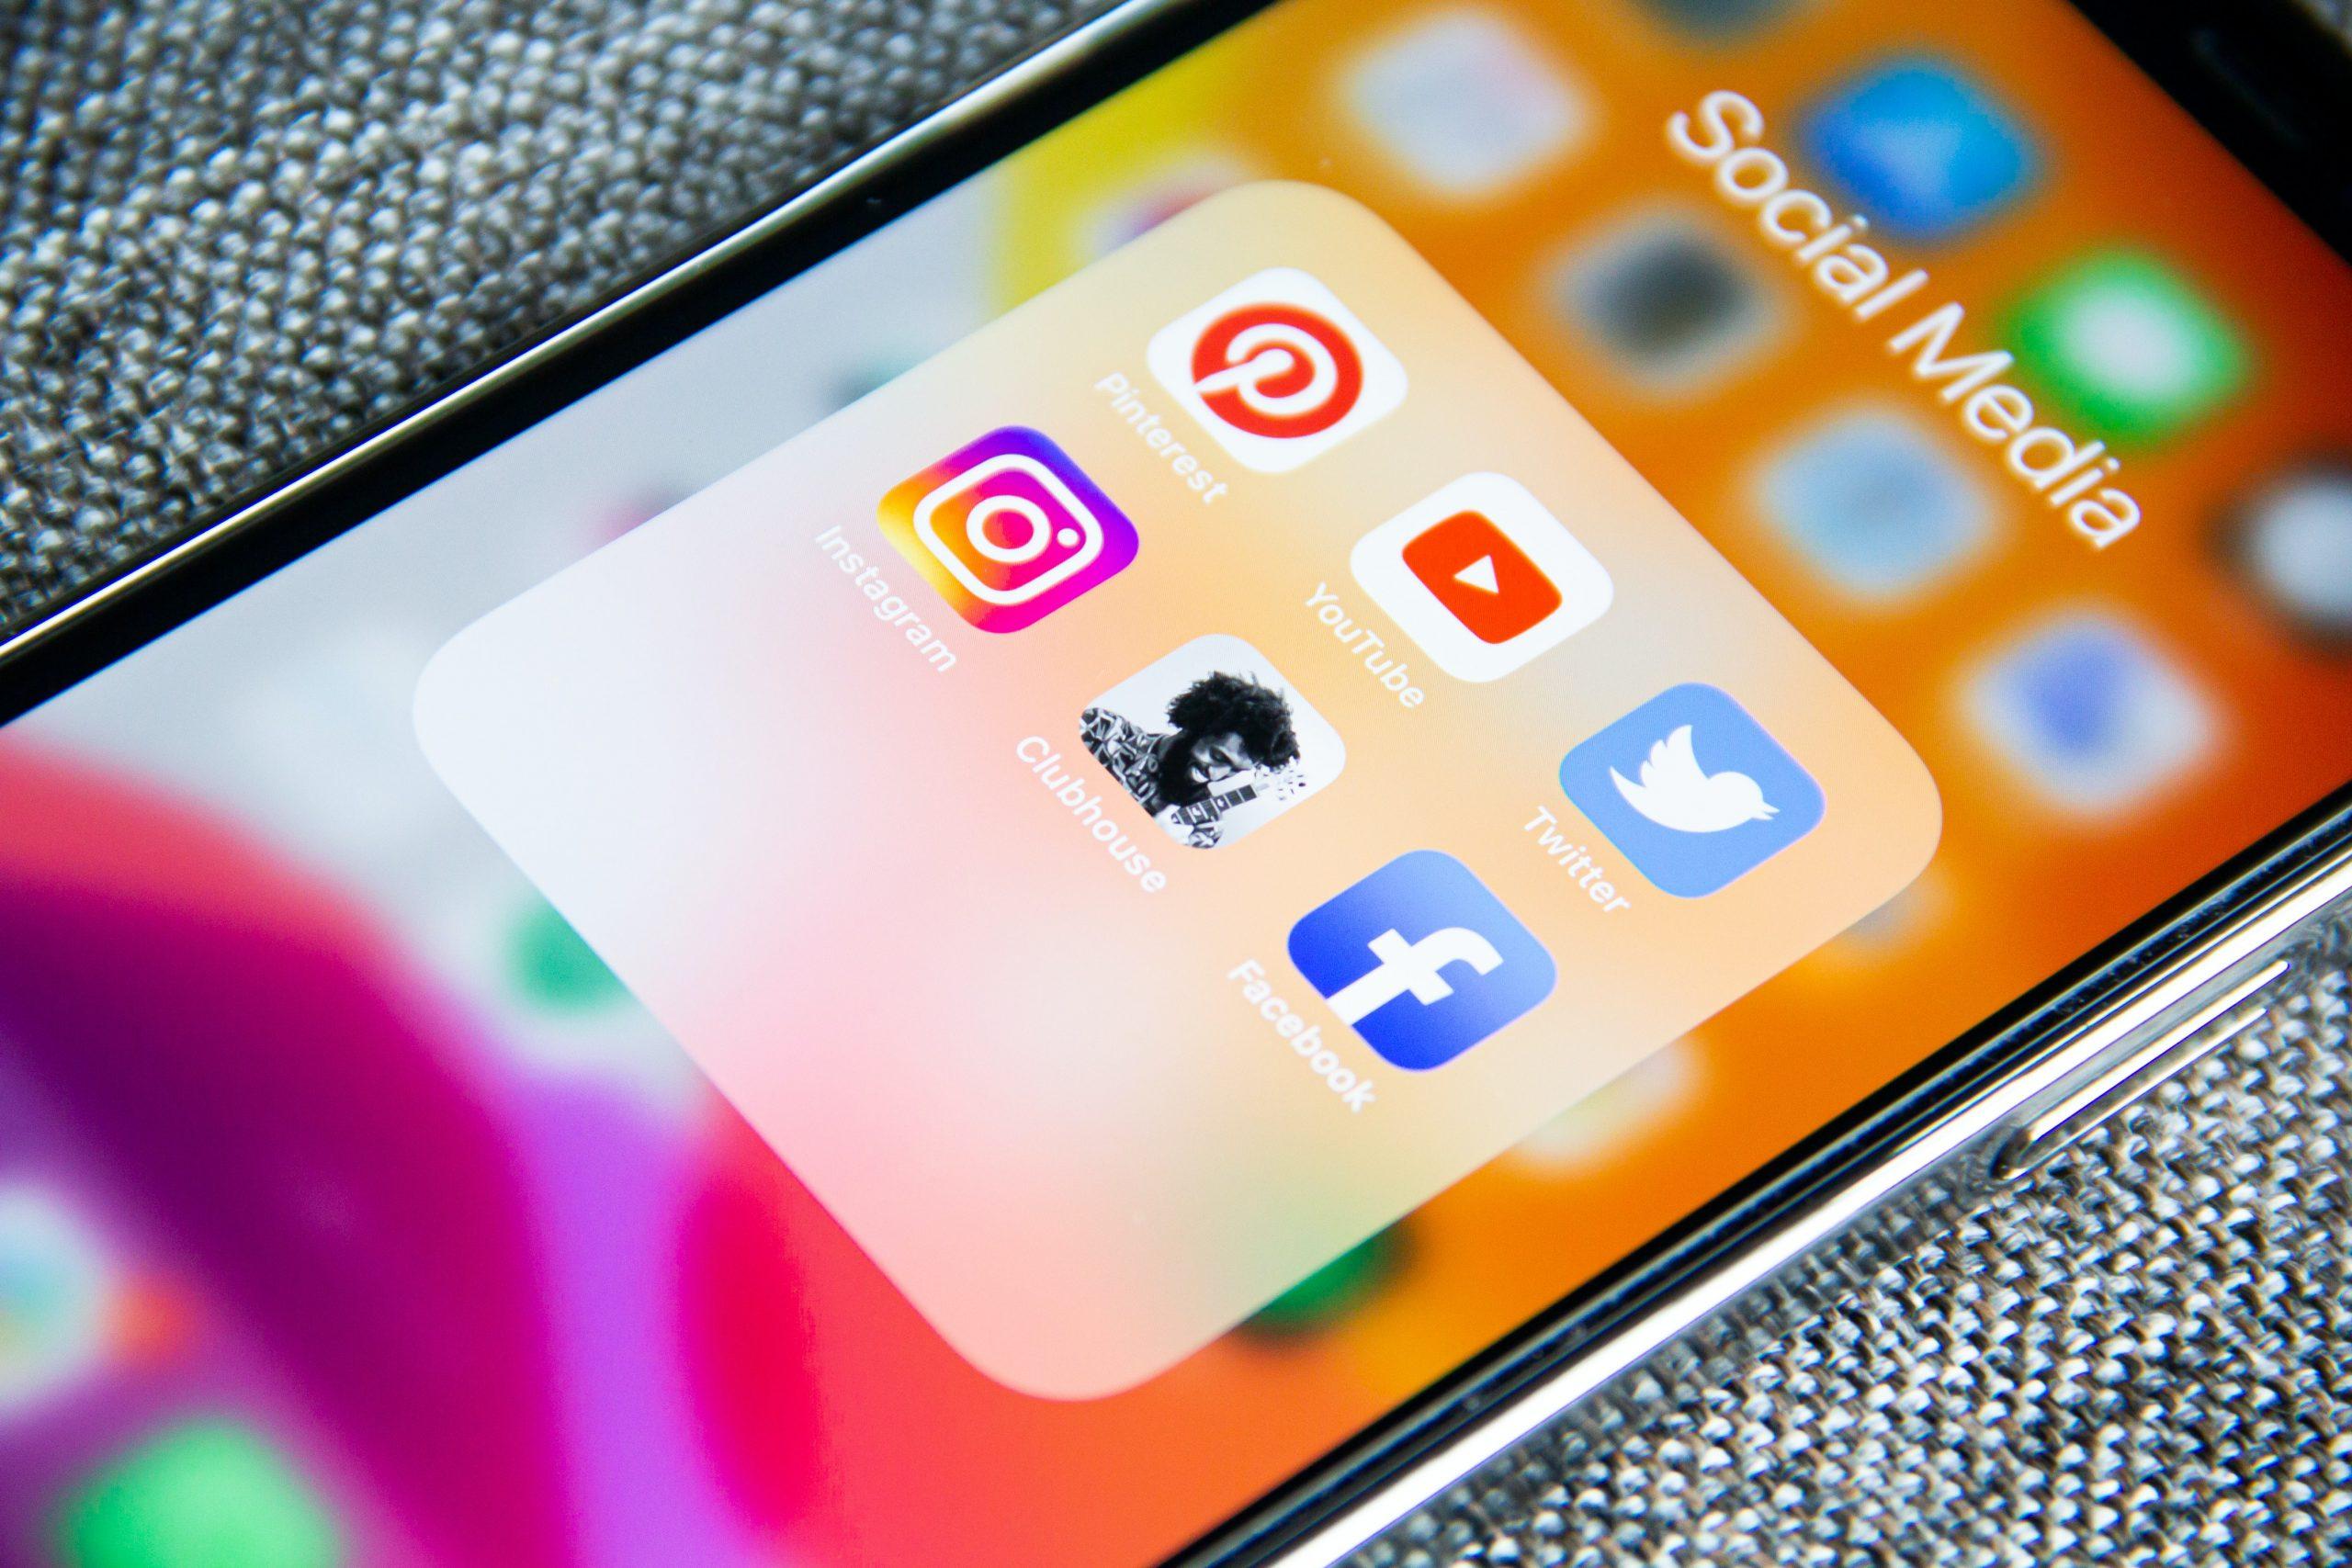 Ecran d'iPhone - dossier Social media - icônes Pinterest, Youtube, Twitter, Instagram, ClubHouse, Facebook